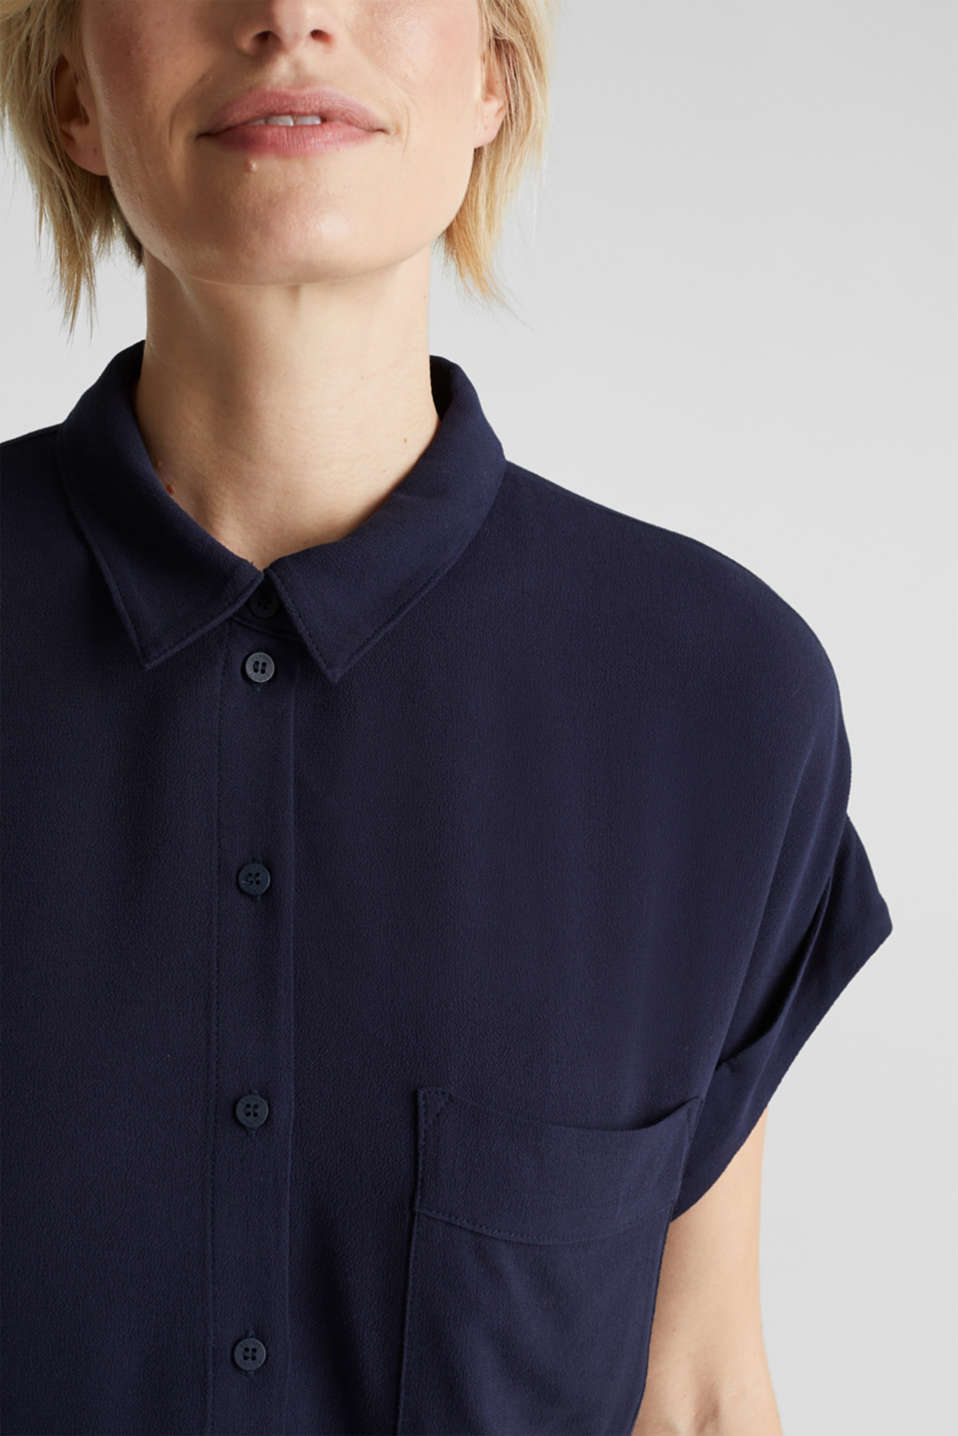 Crêpe blouse top, NAVY, detail image number 2